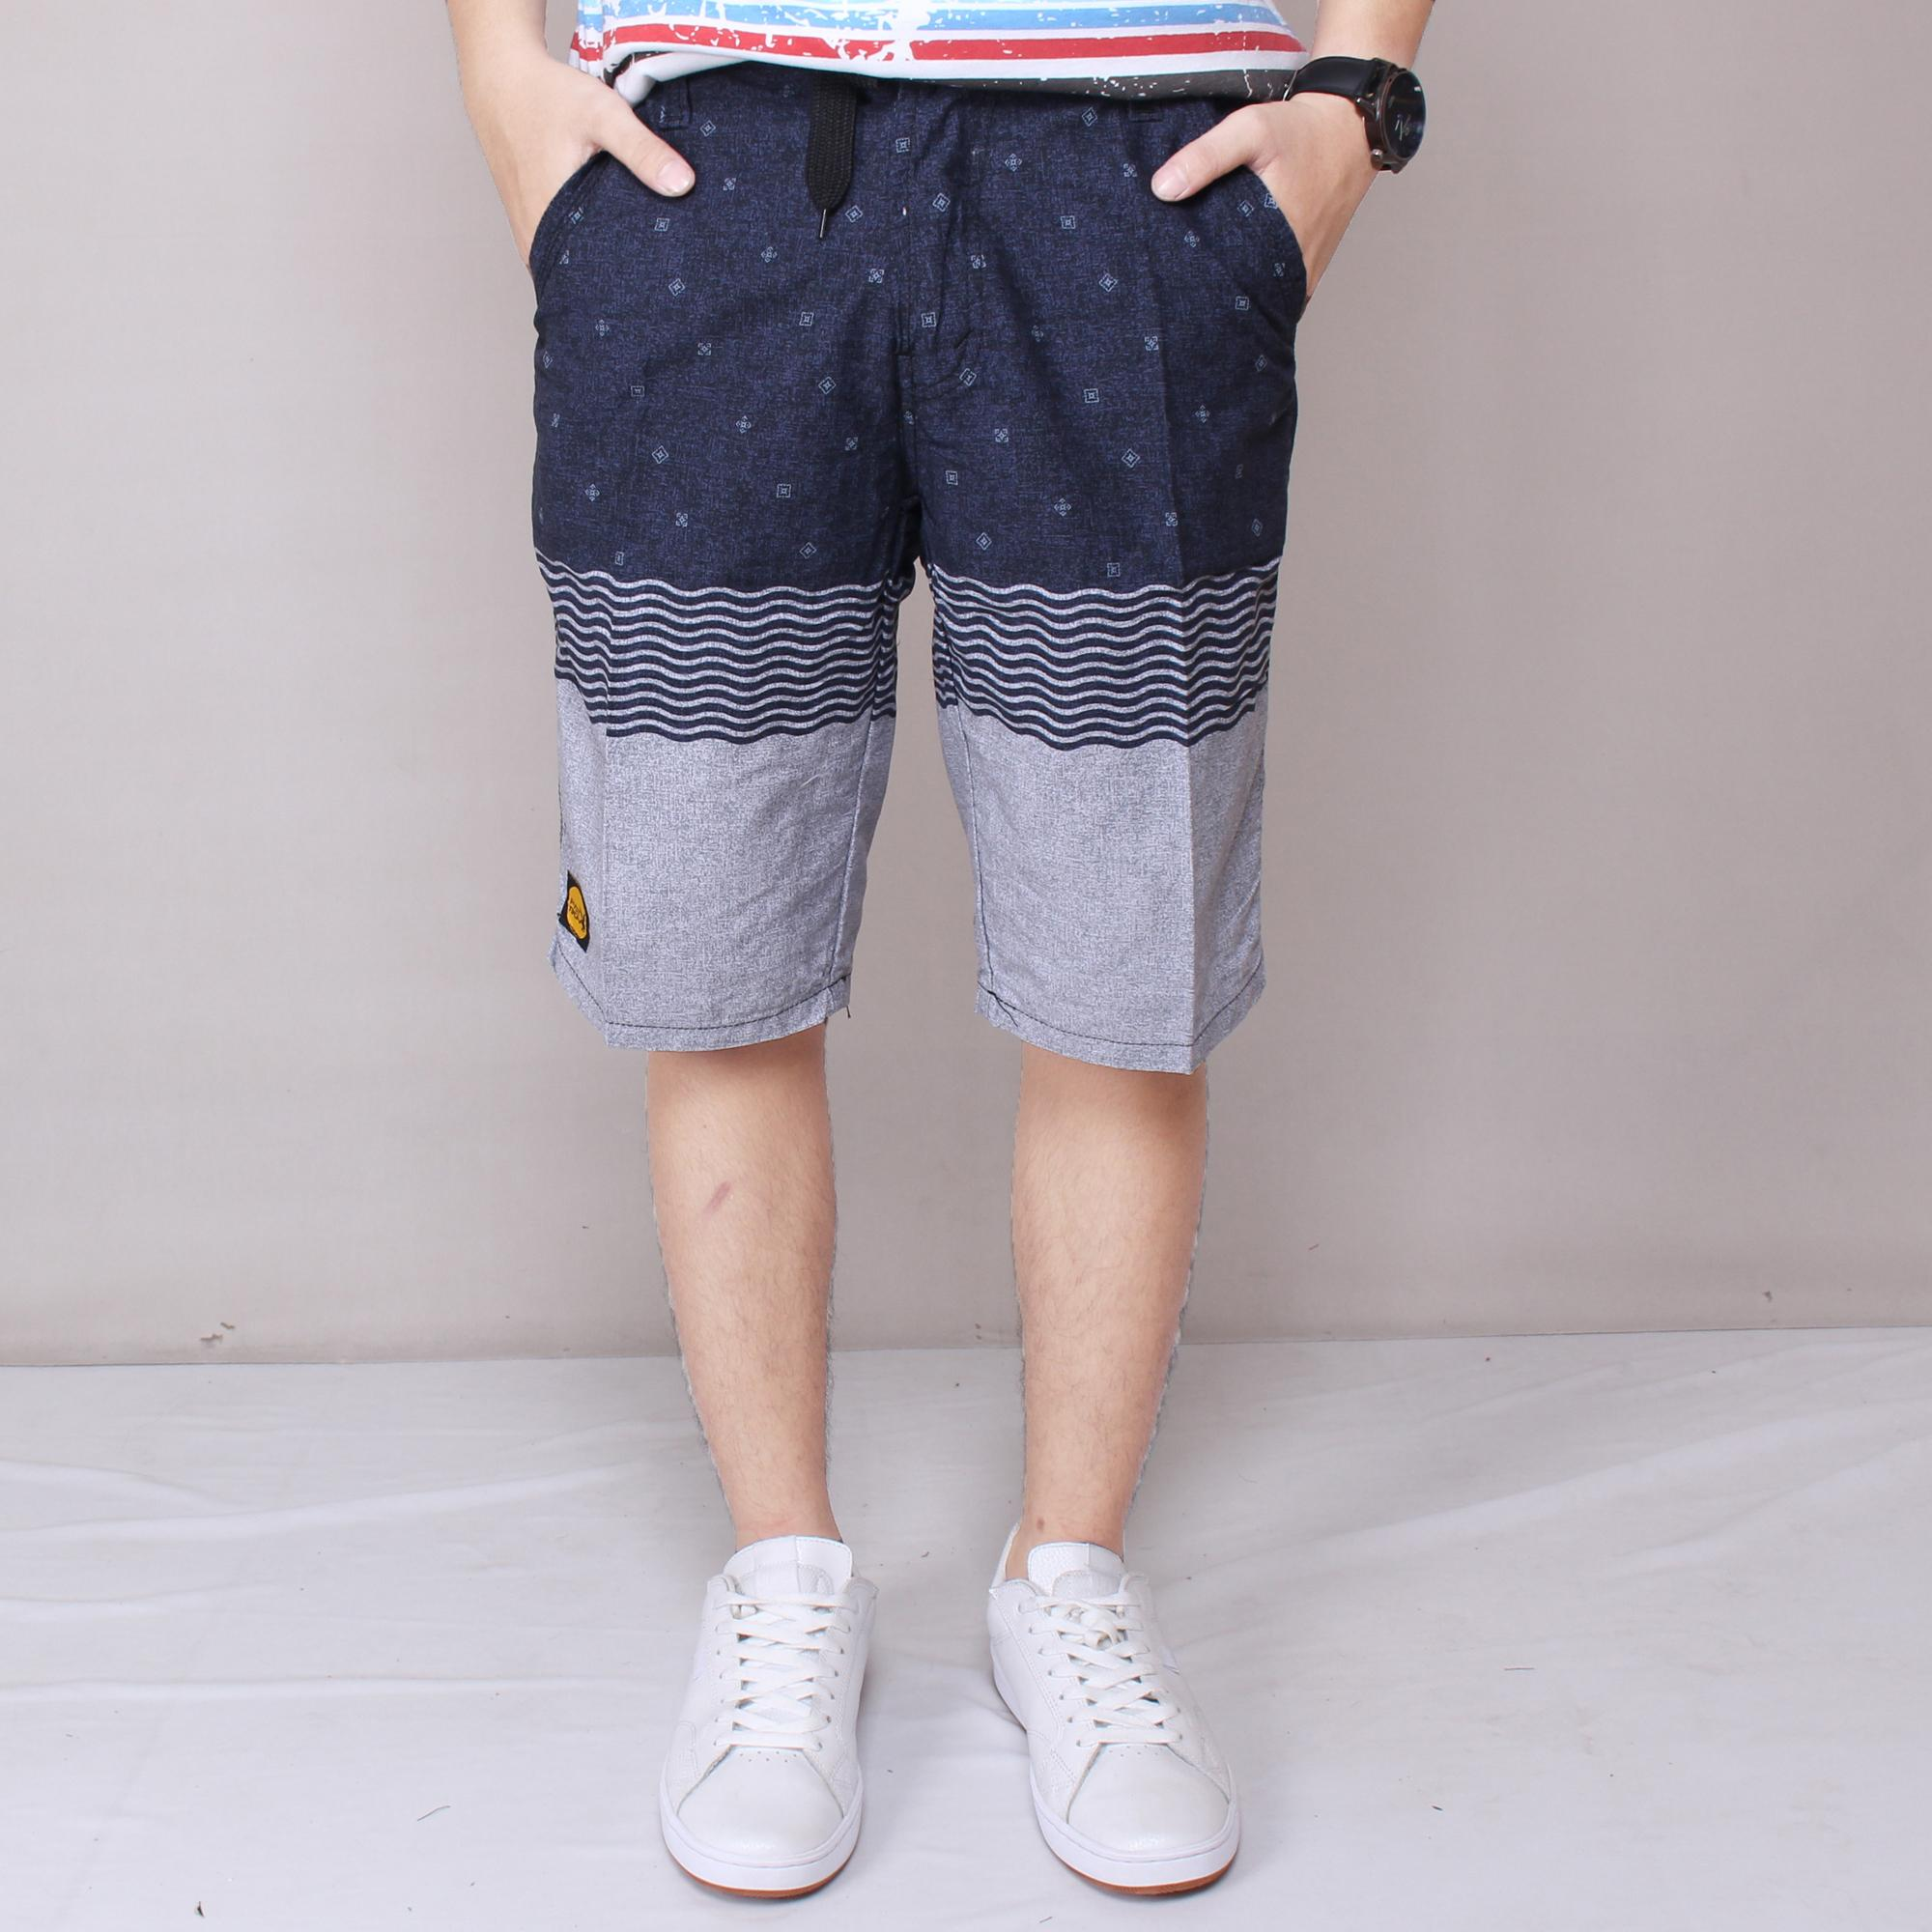 ZS_Fashion 5961 Celana Pendek Distro Celana Santai Motif Acak Celana Pendek Exclusive